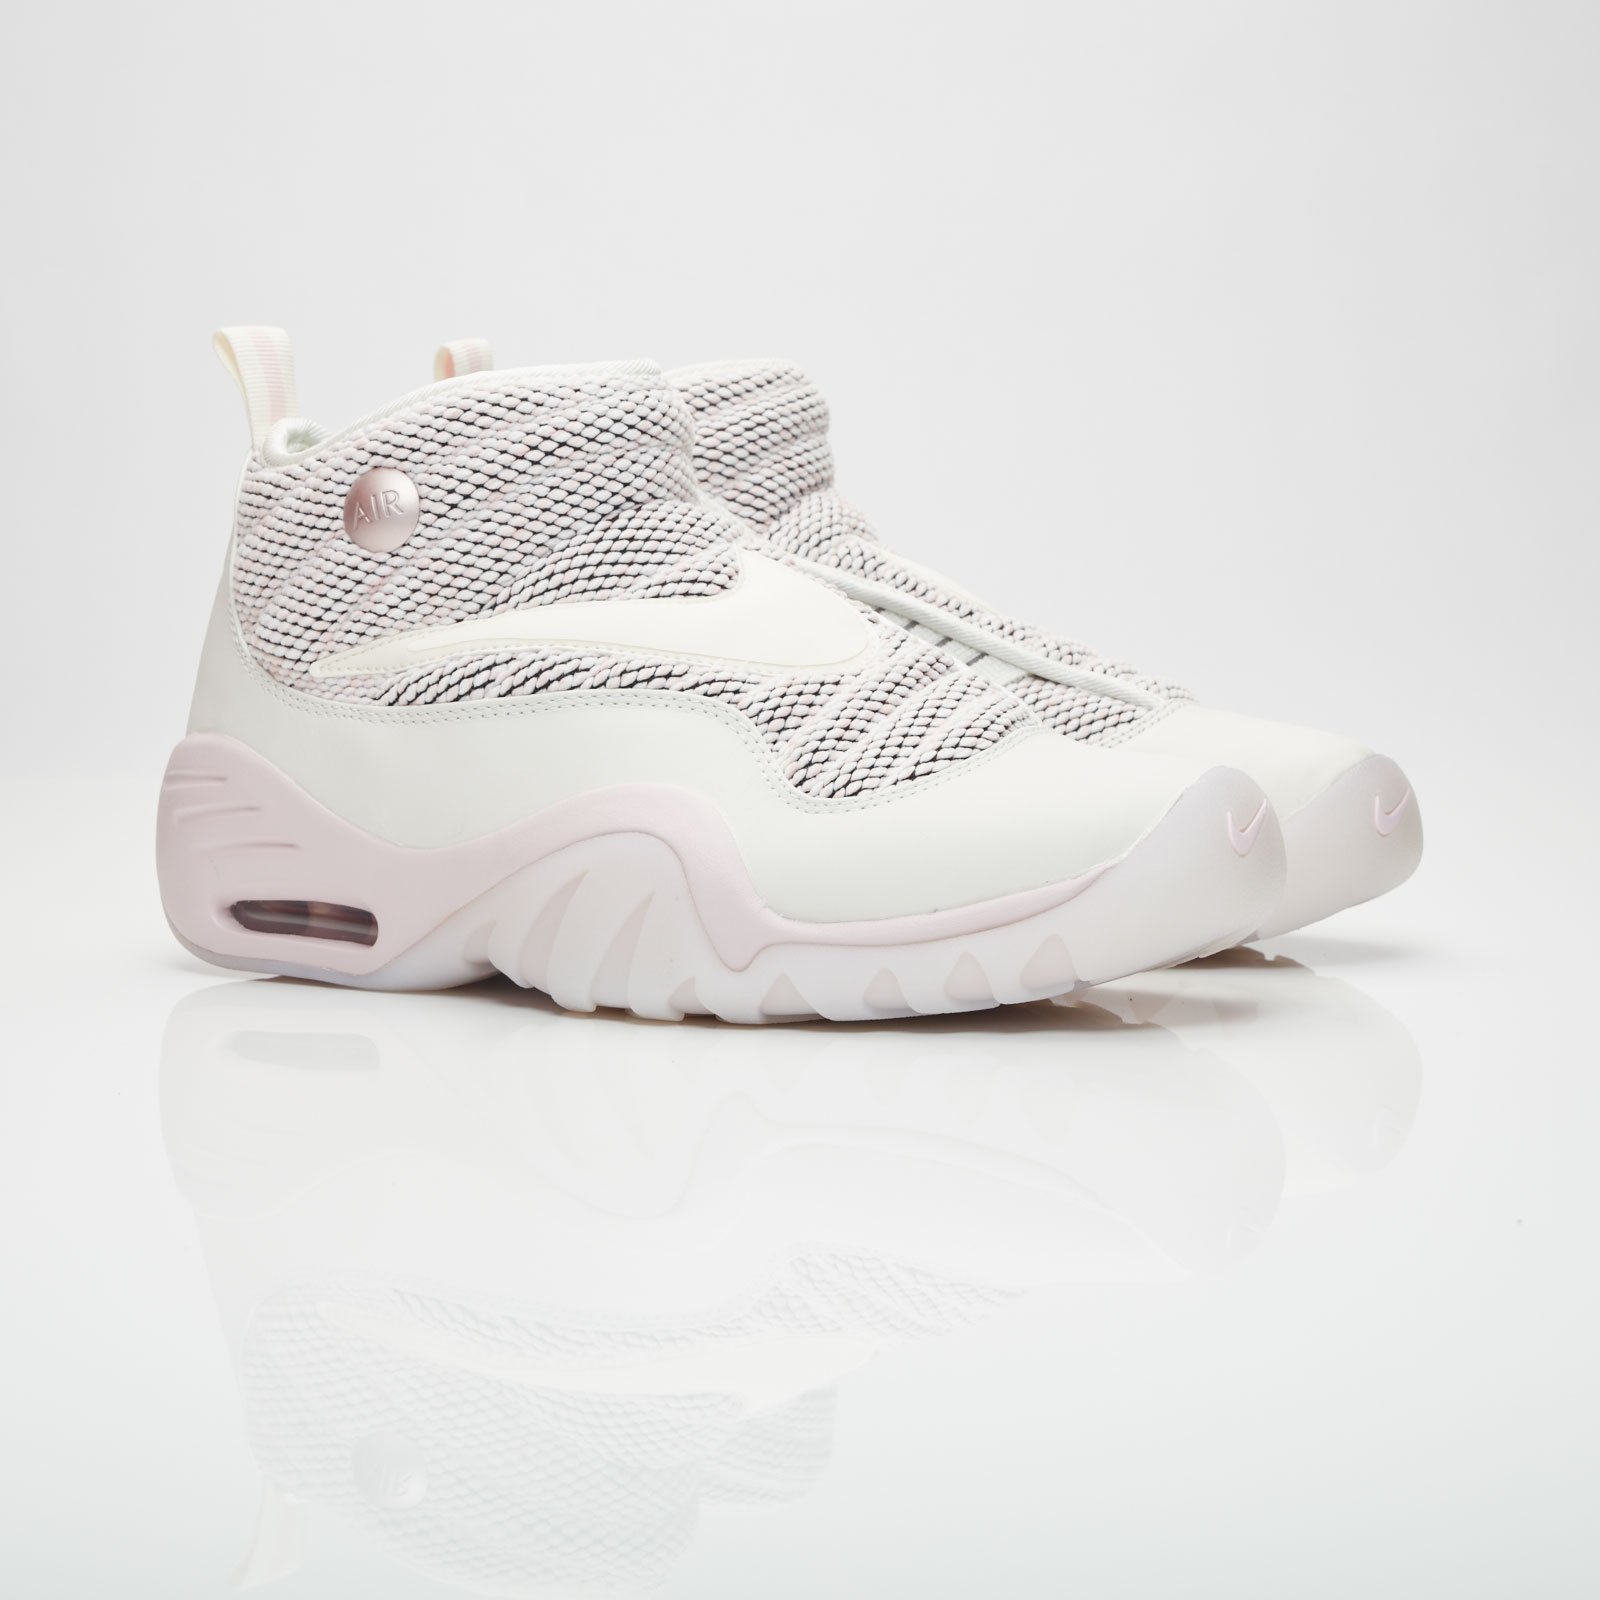 Nike Air Shake Ndestrukt / Pigalle